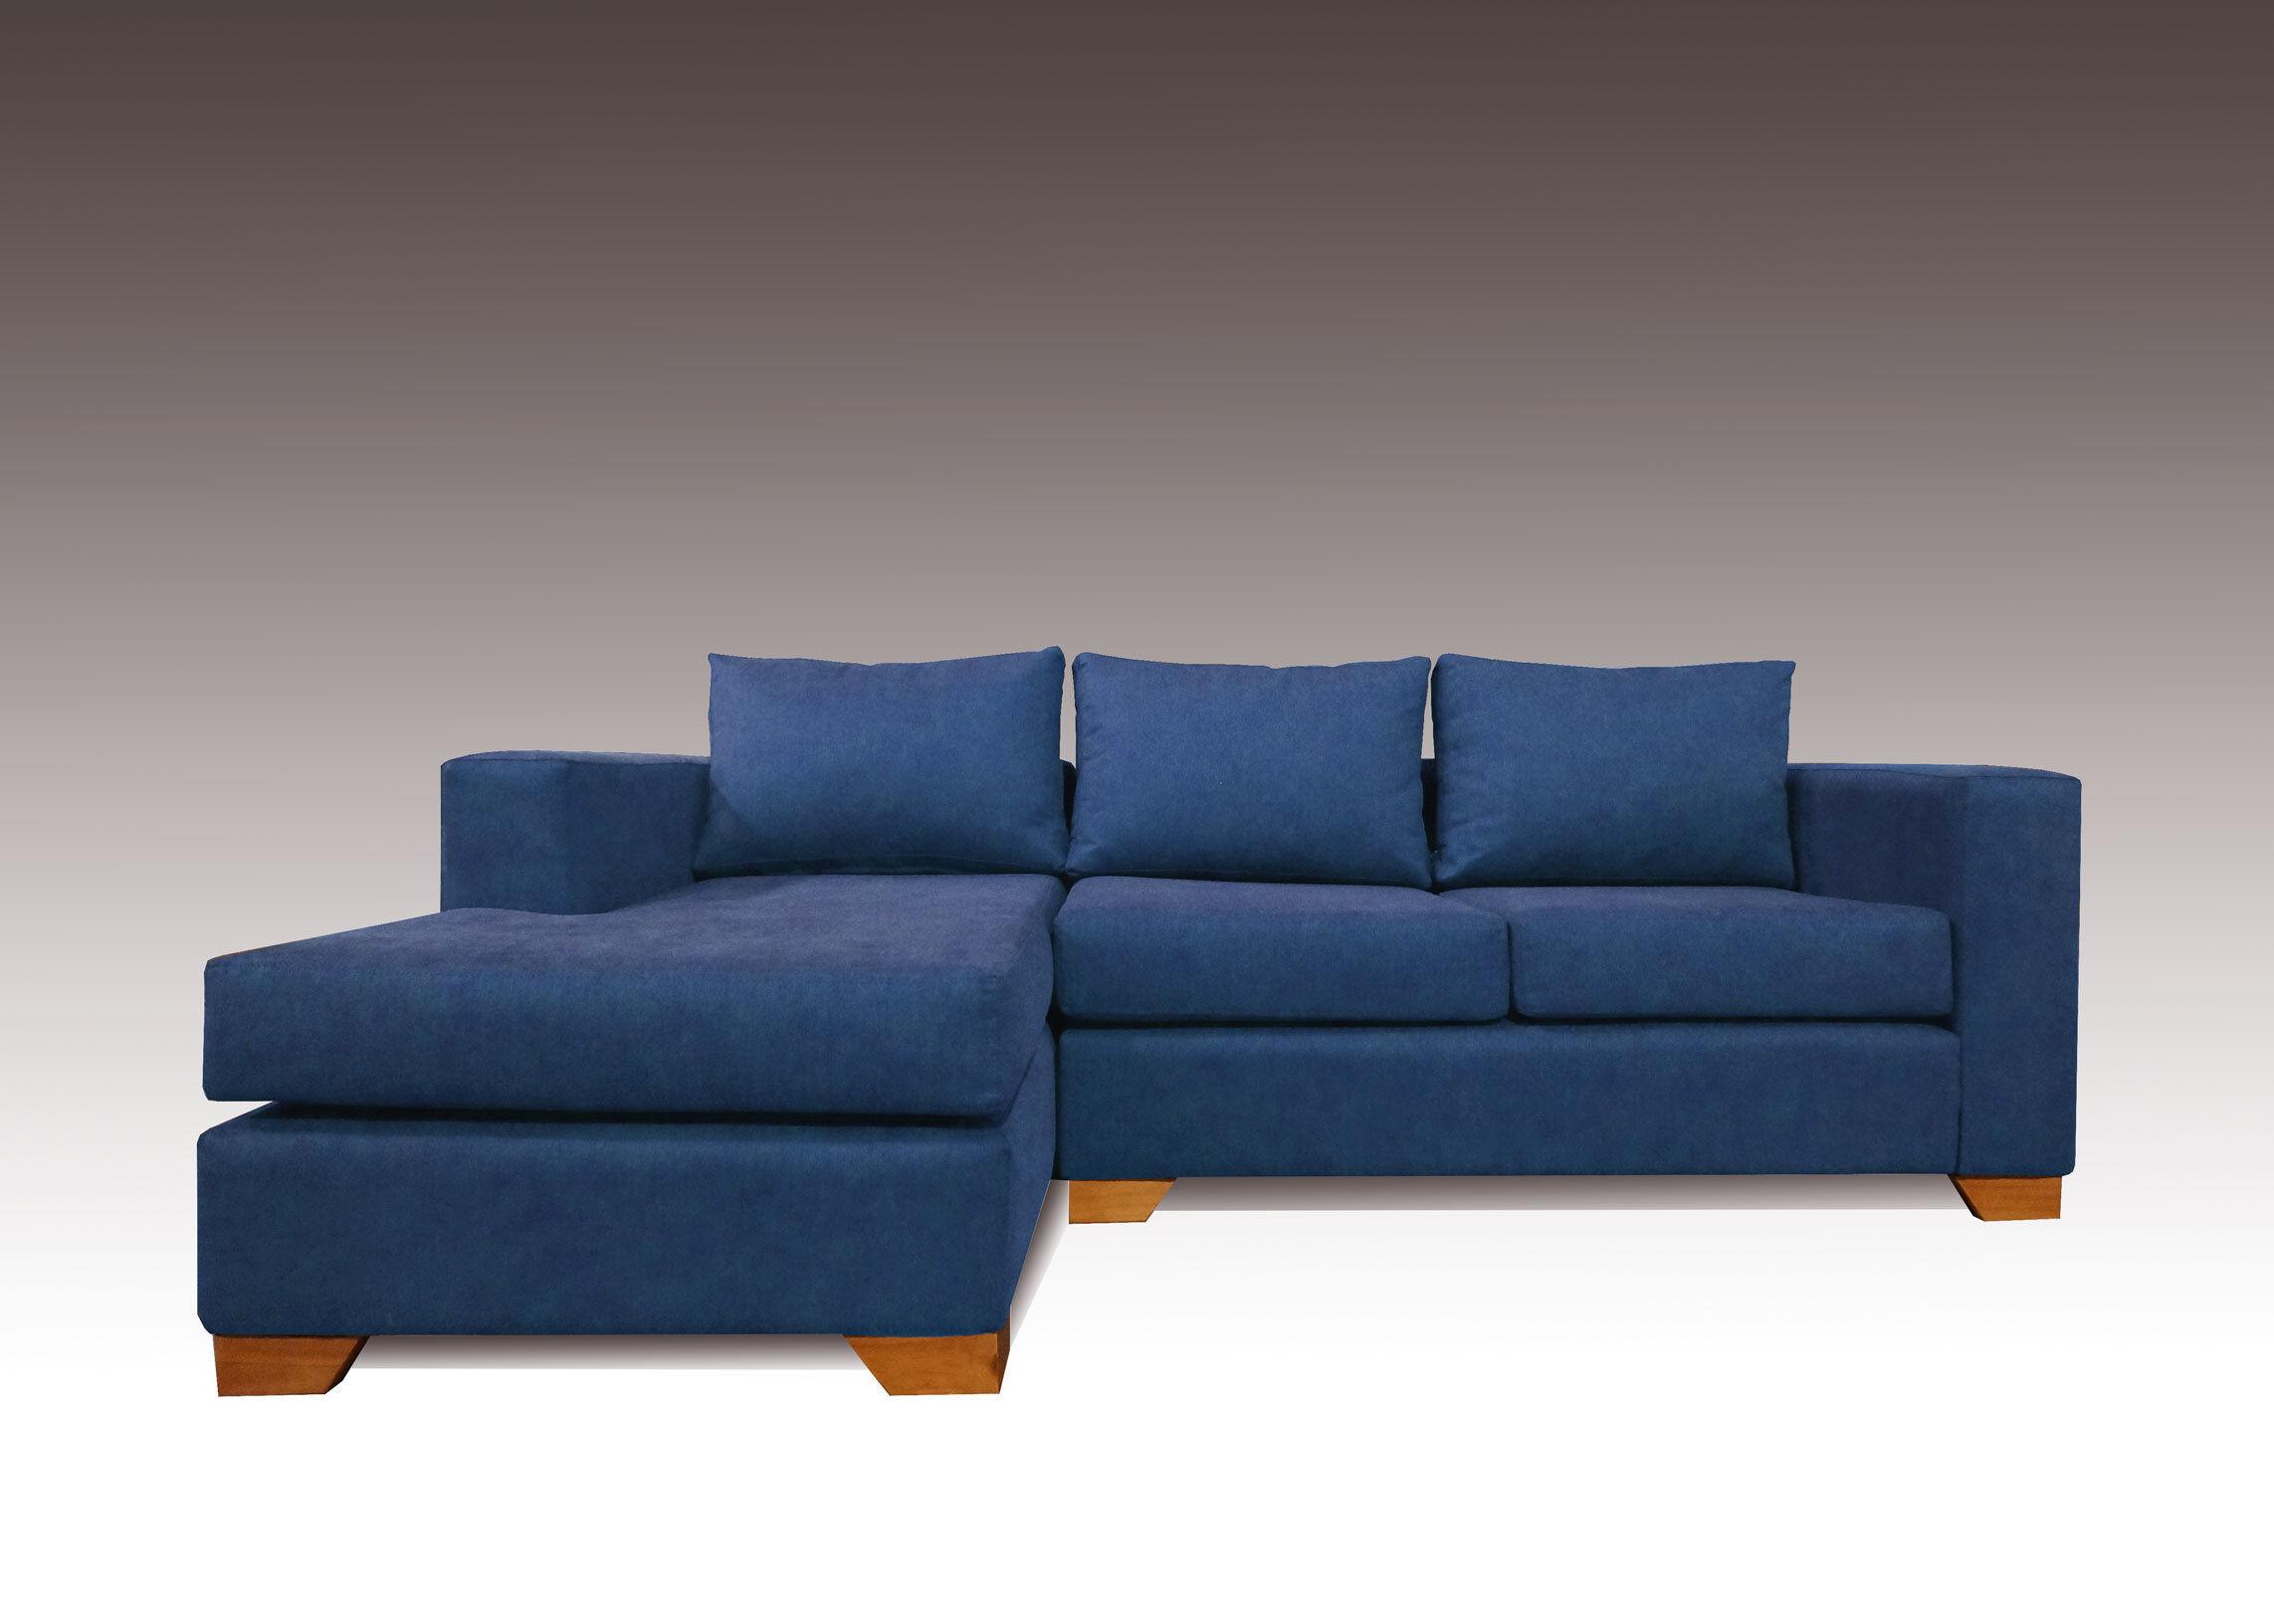 Sof seccional m naco chaise longue izquierdo calafate for Chaise longue azul turquesa